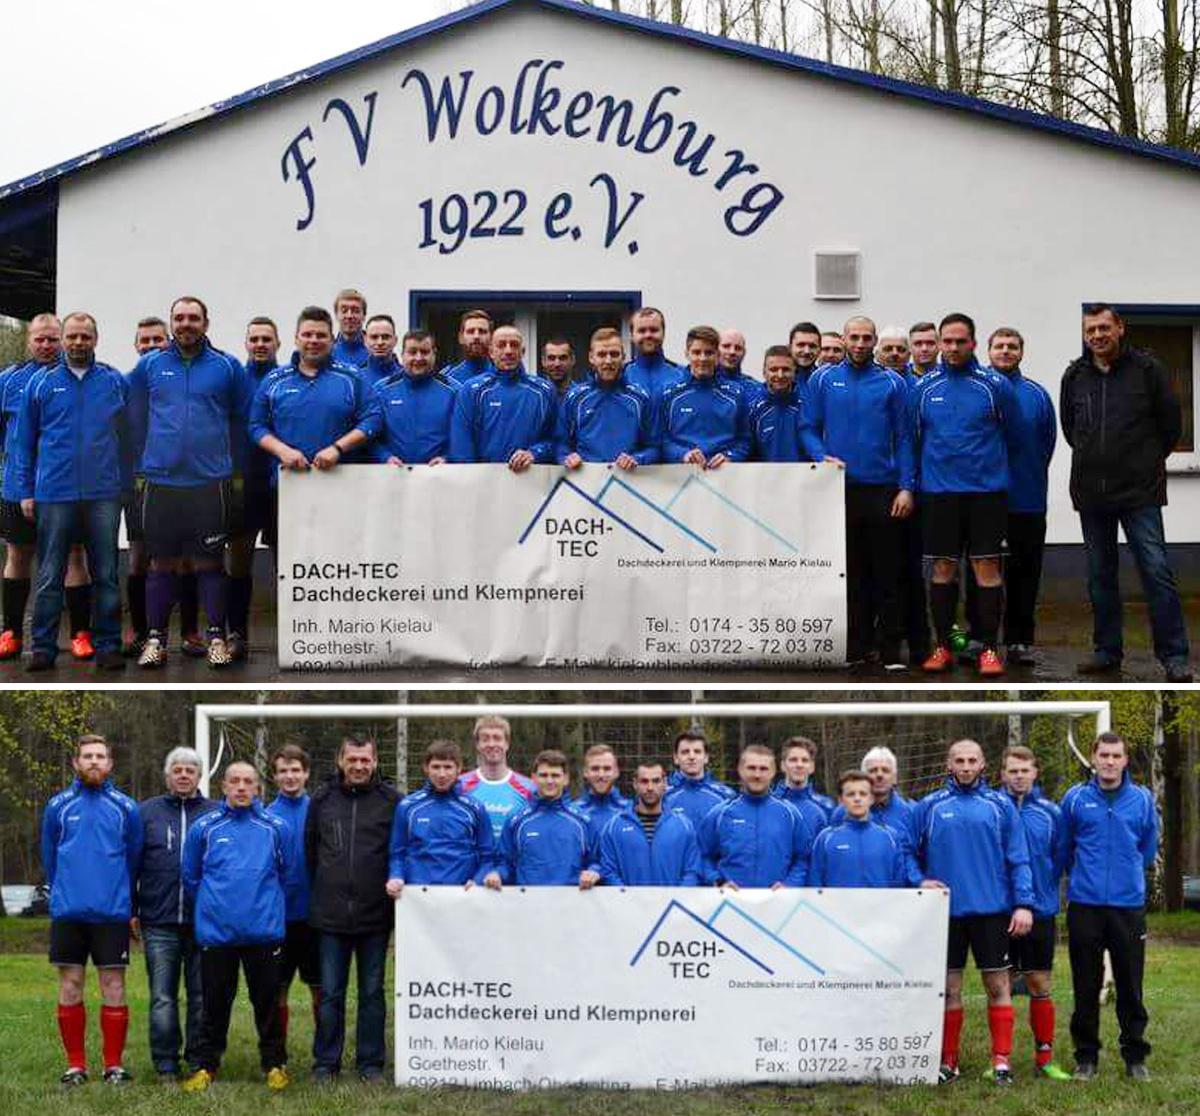 DACH-TEC sponsert FV Wolkenburg